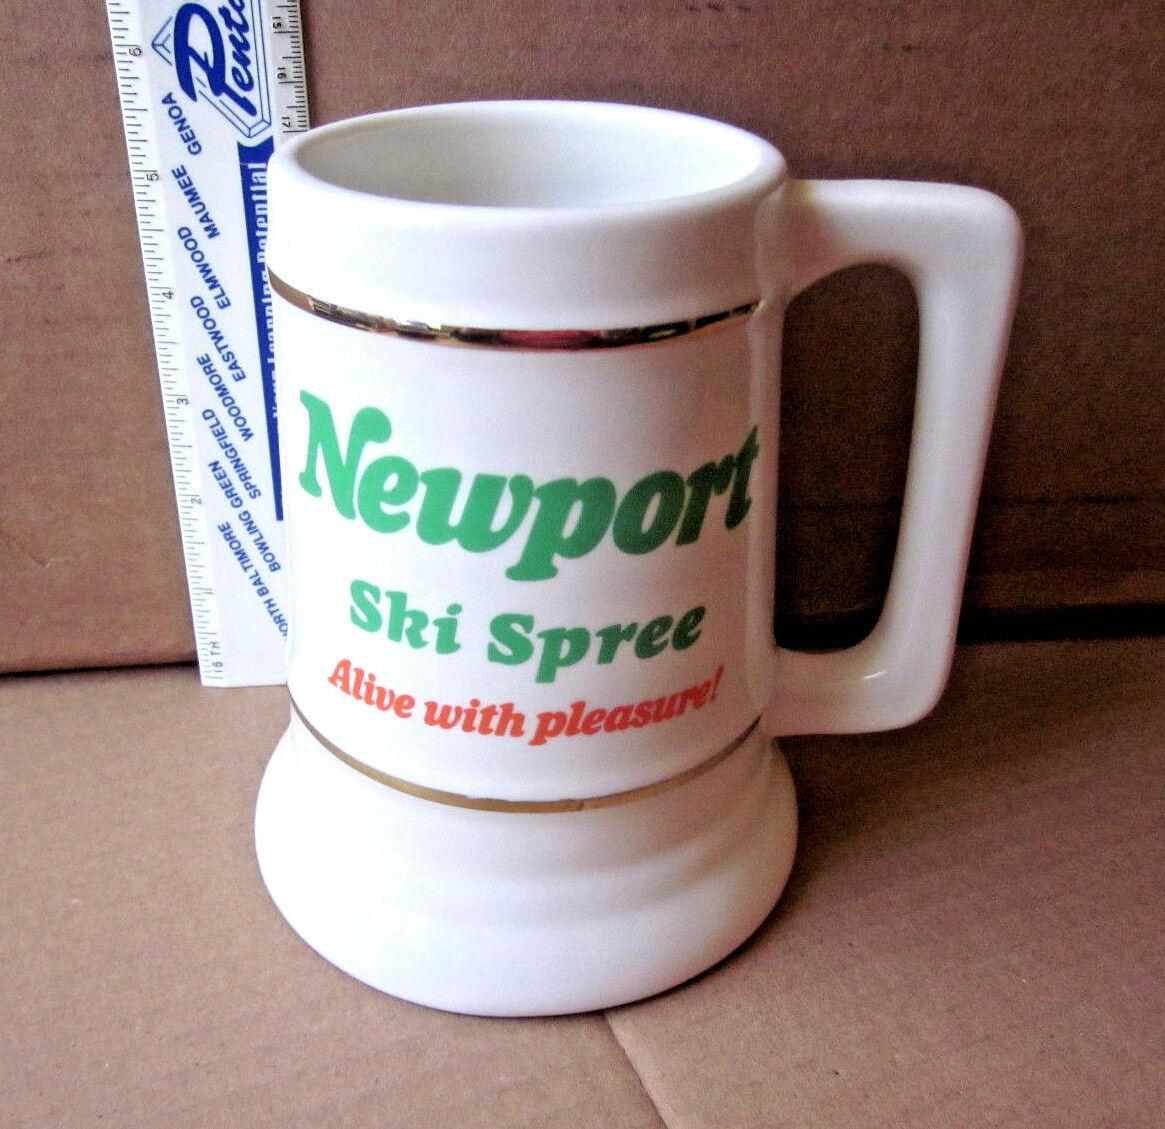 NEWPORT beer stein Ski Spree 1988 menthol cigarettes Dance Contest coffee mug